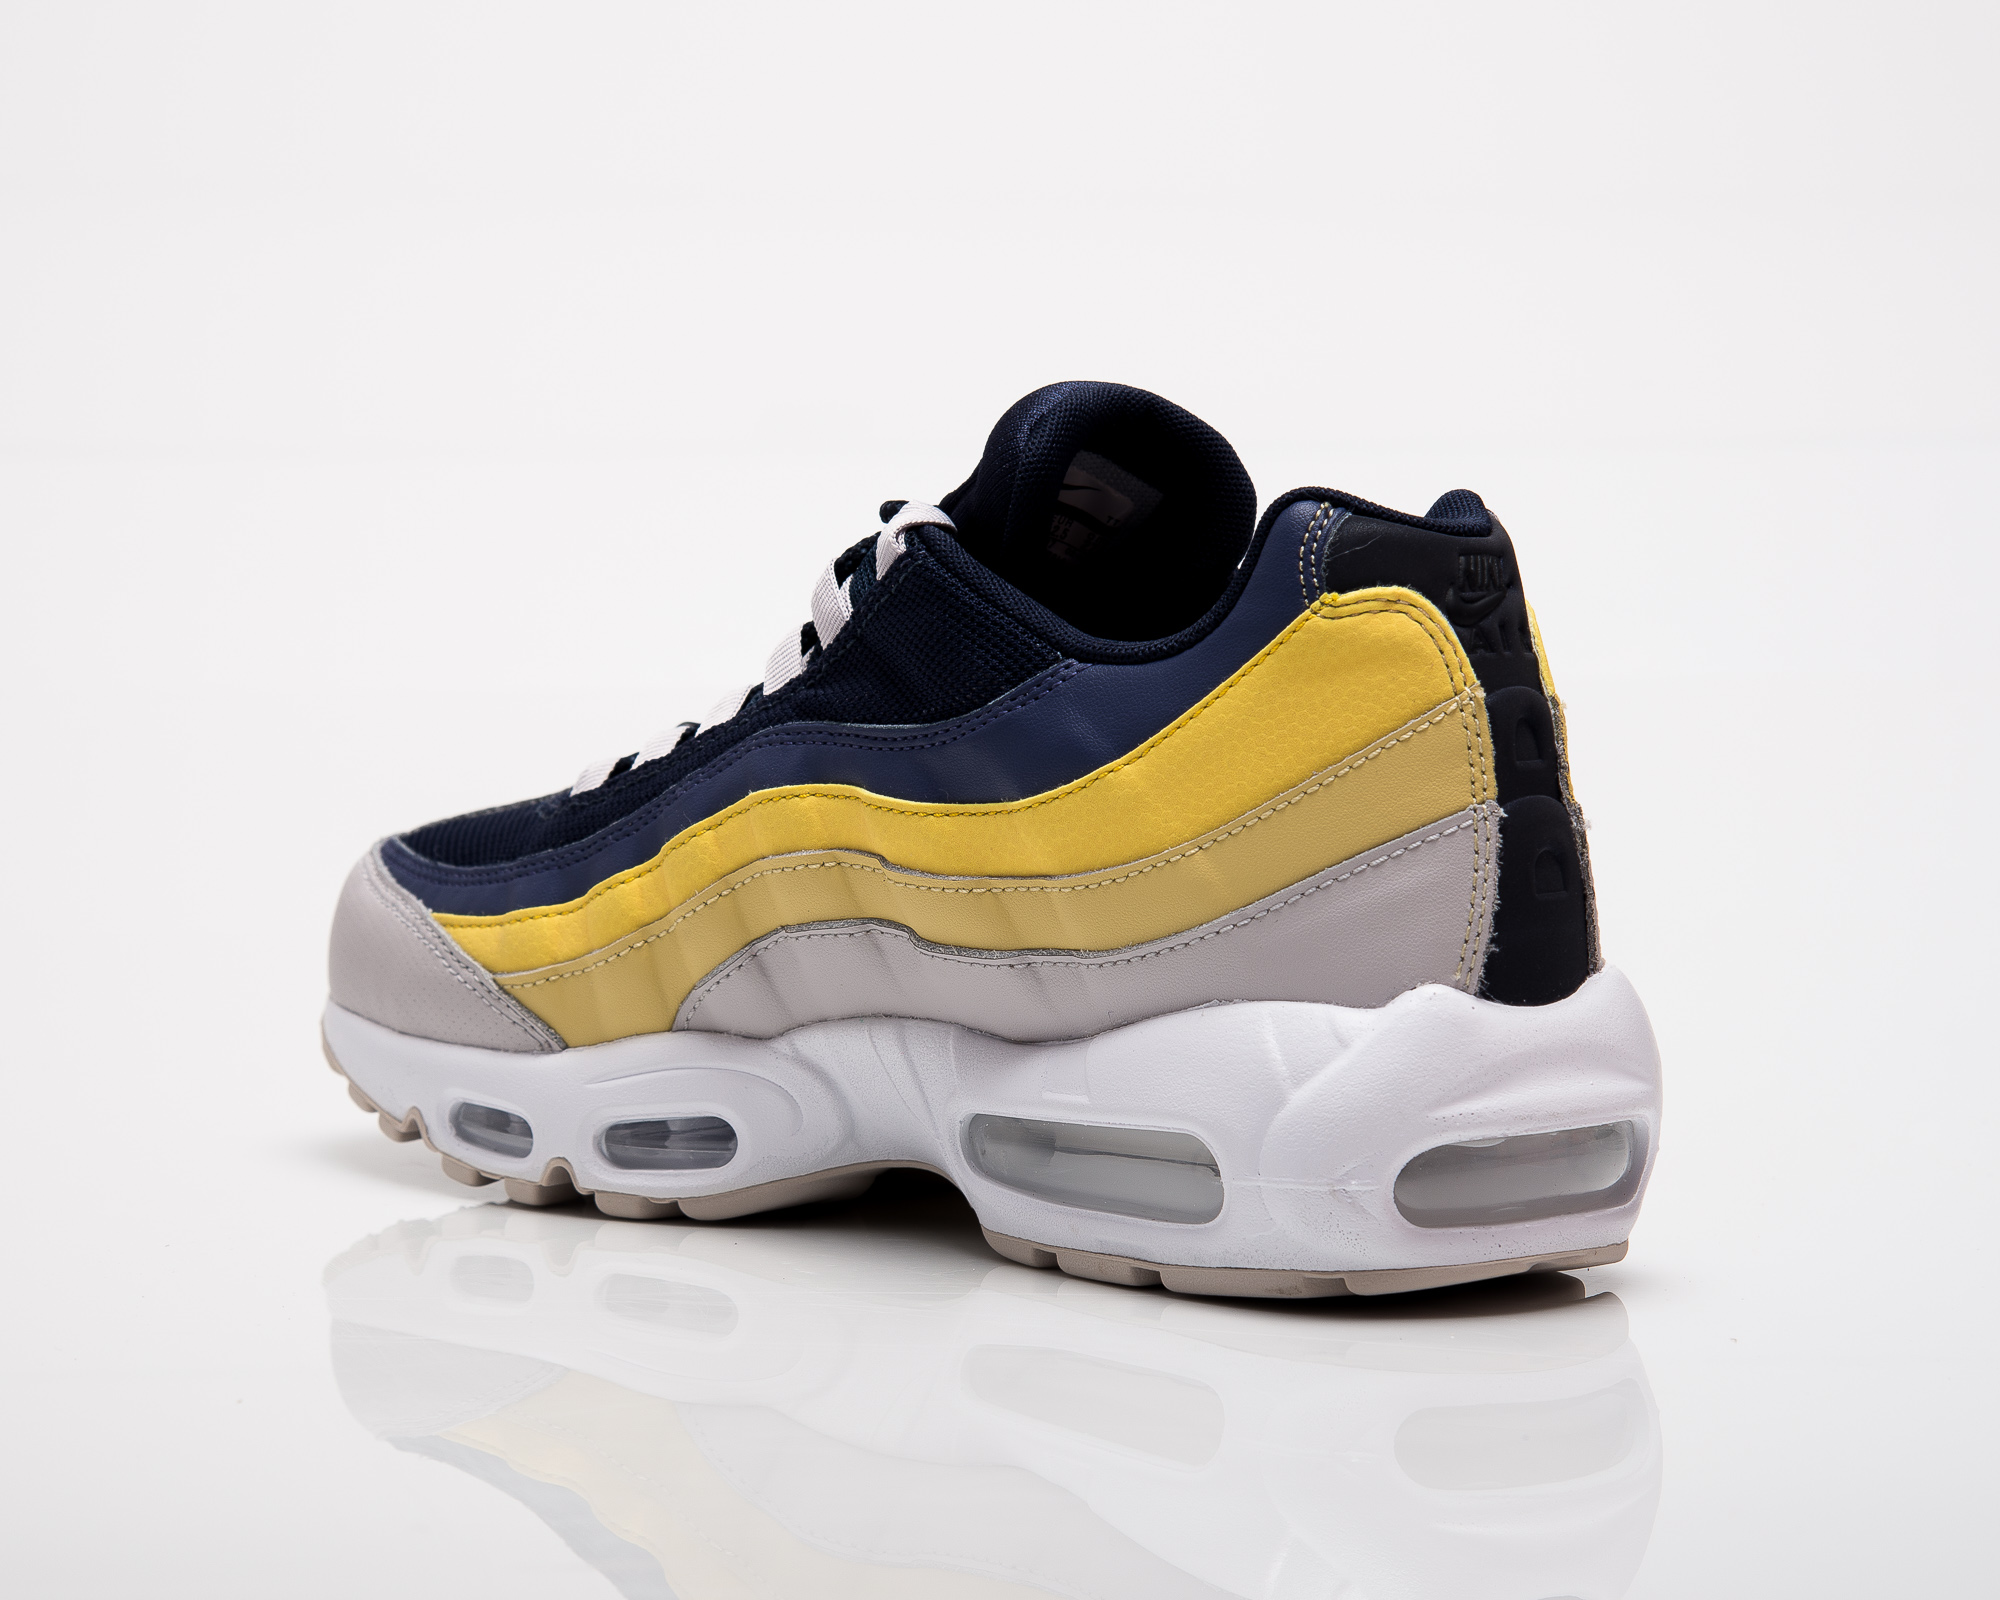 8ae2bd733803fc Nike Air Max 95 Essential Lemon Wash - Shoes Casual - Sporting goods ...